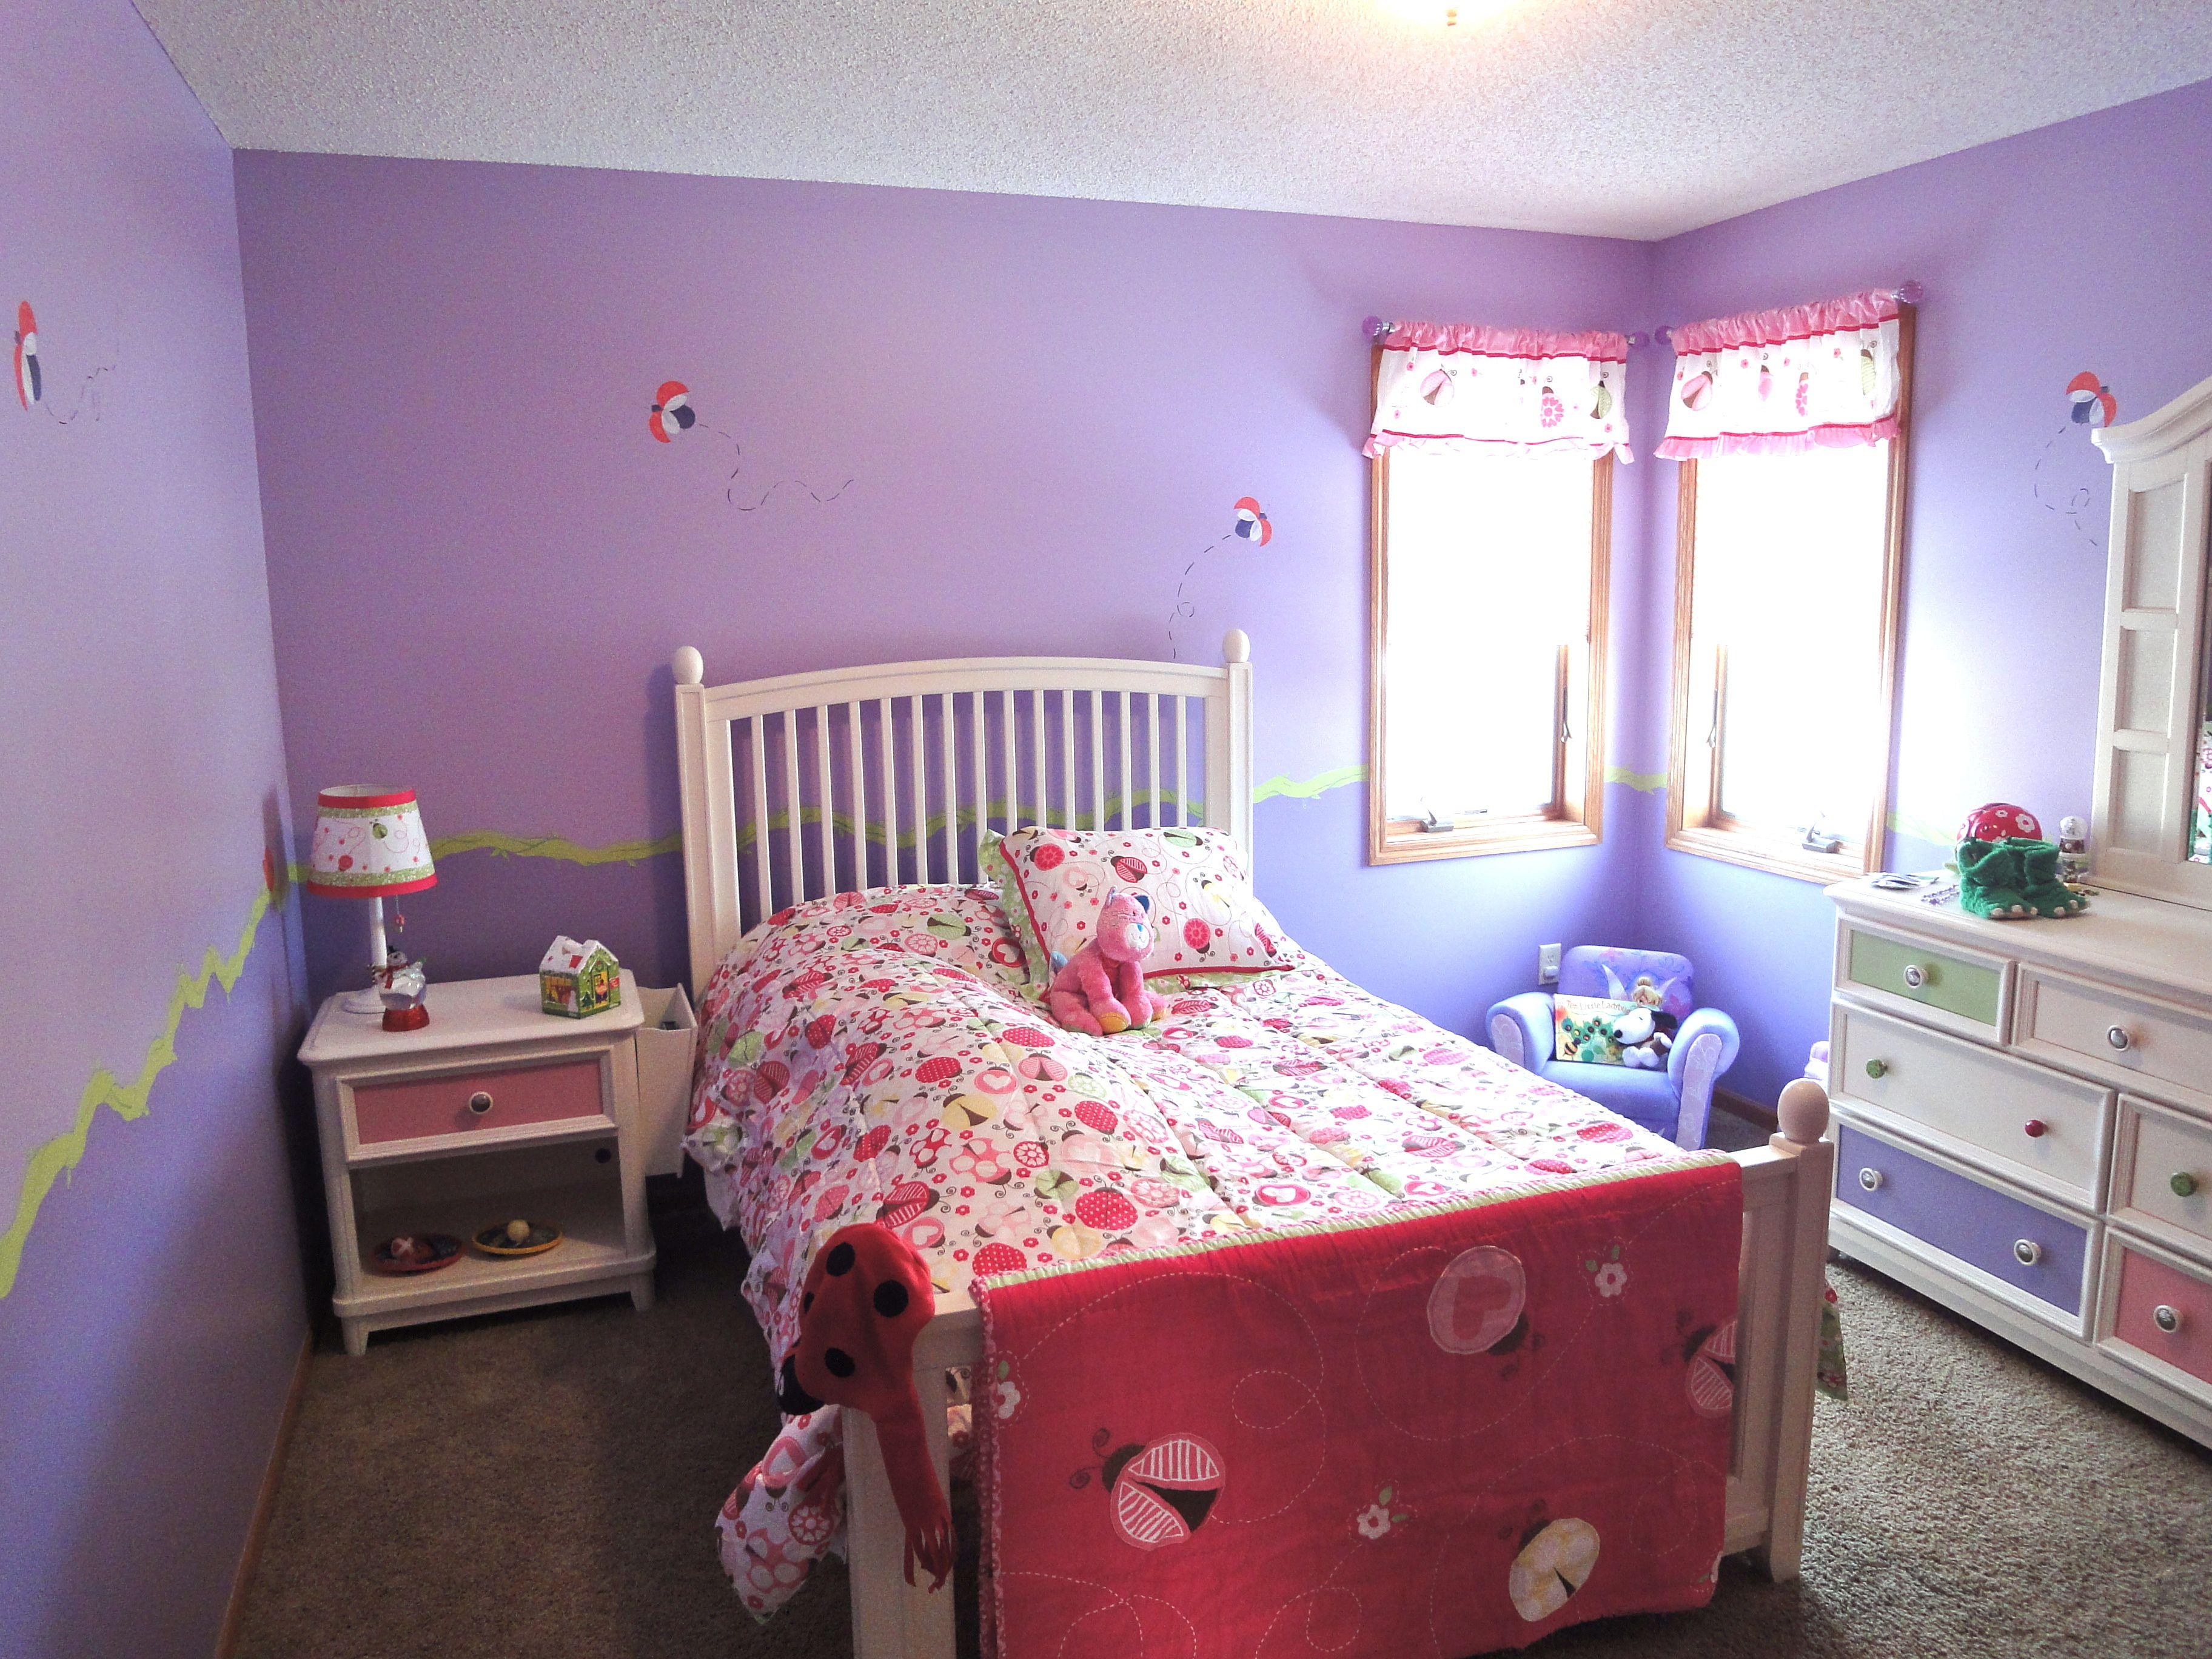 Best Ladybug Room Simple But Fun Ladybug Bedroom Ladybug 400 x 300